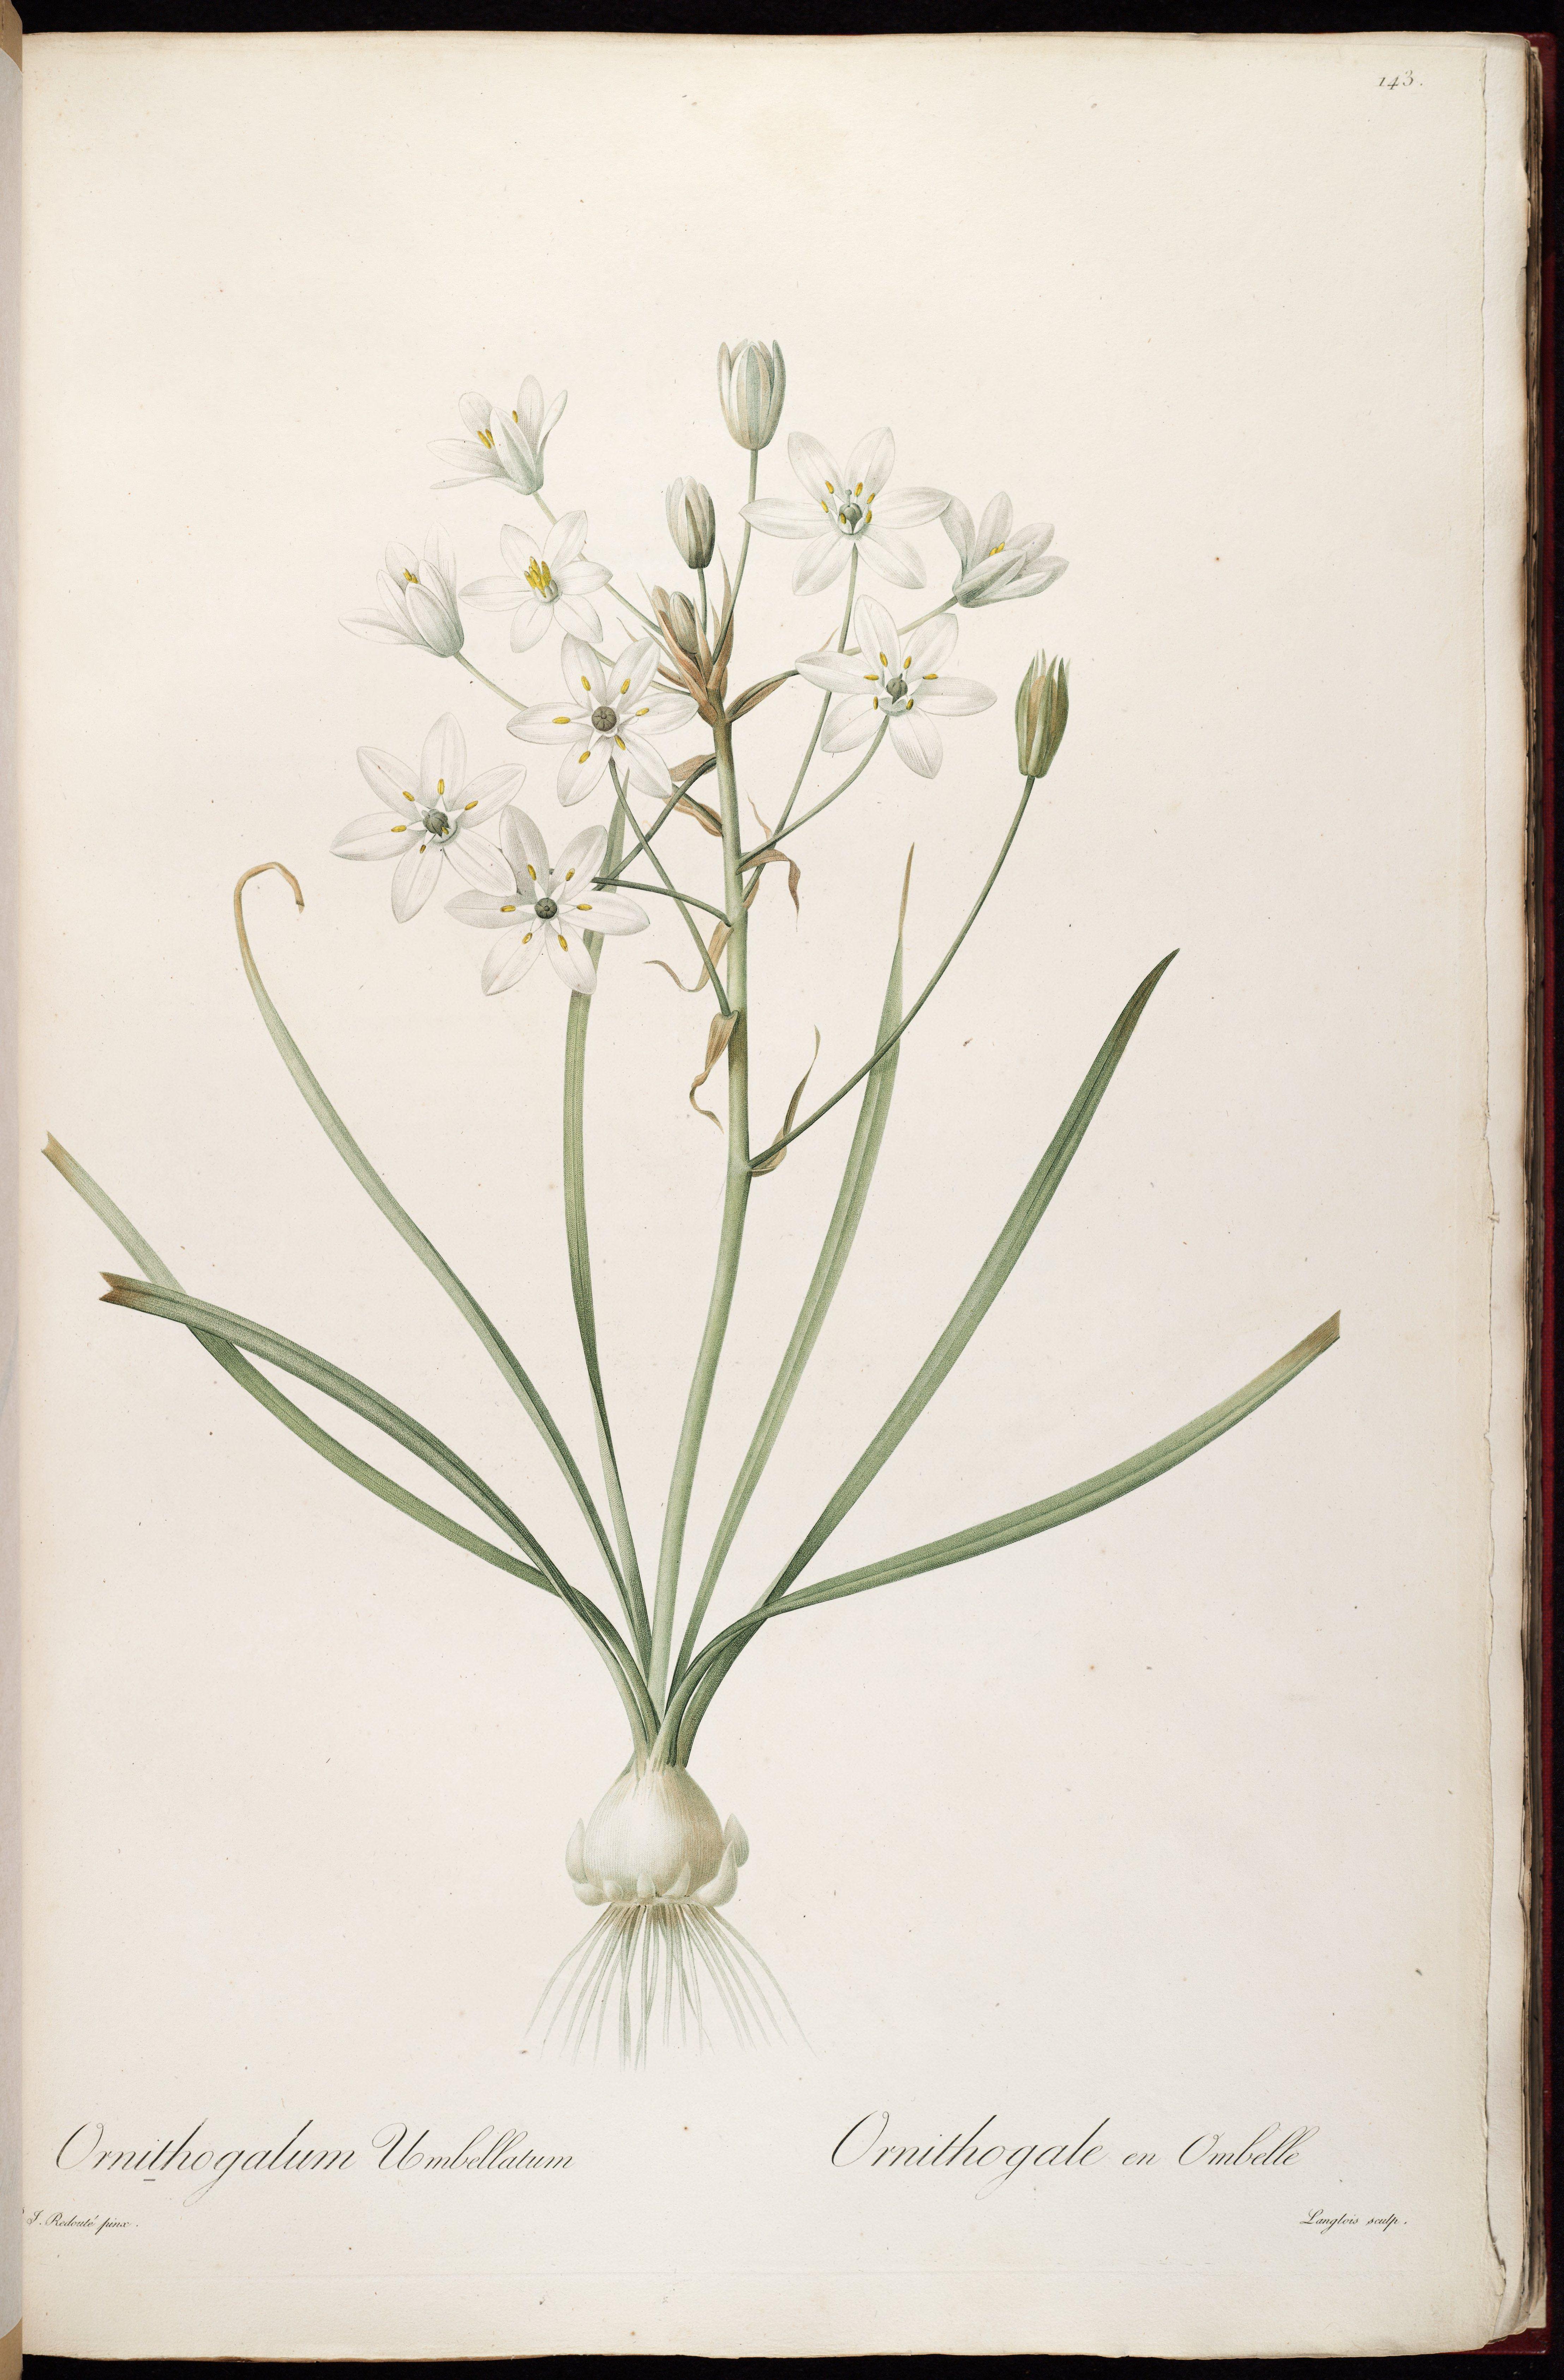 Star of Bethlehem Ornithogalum umbellatum circa 1805 1816